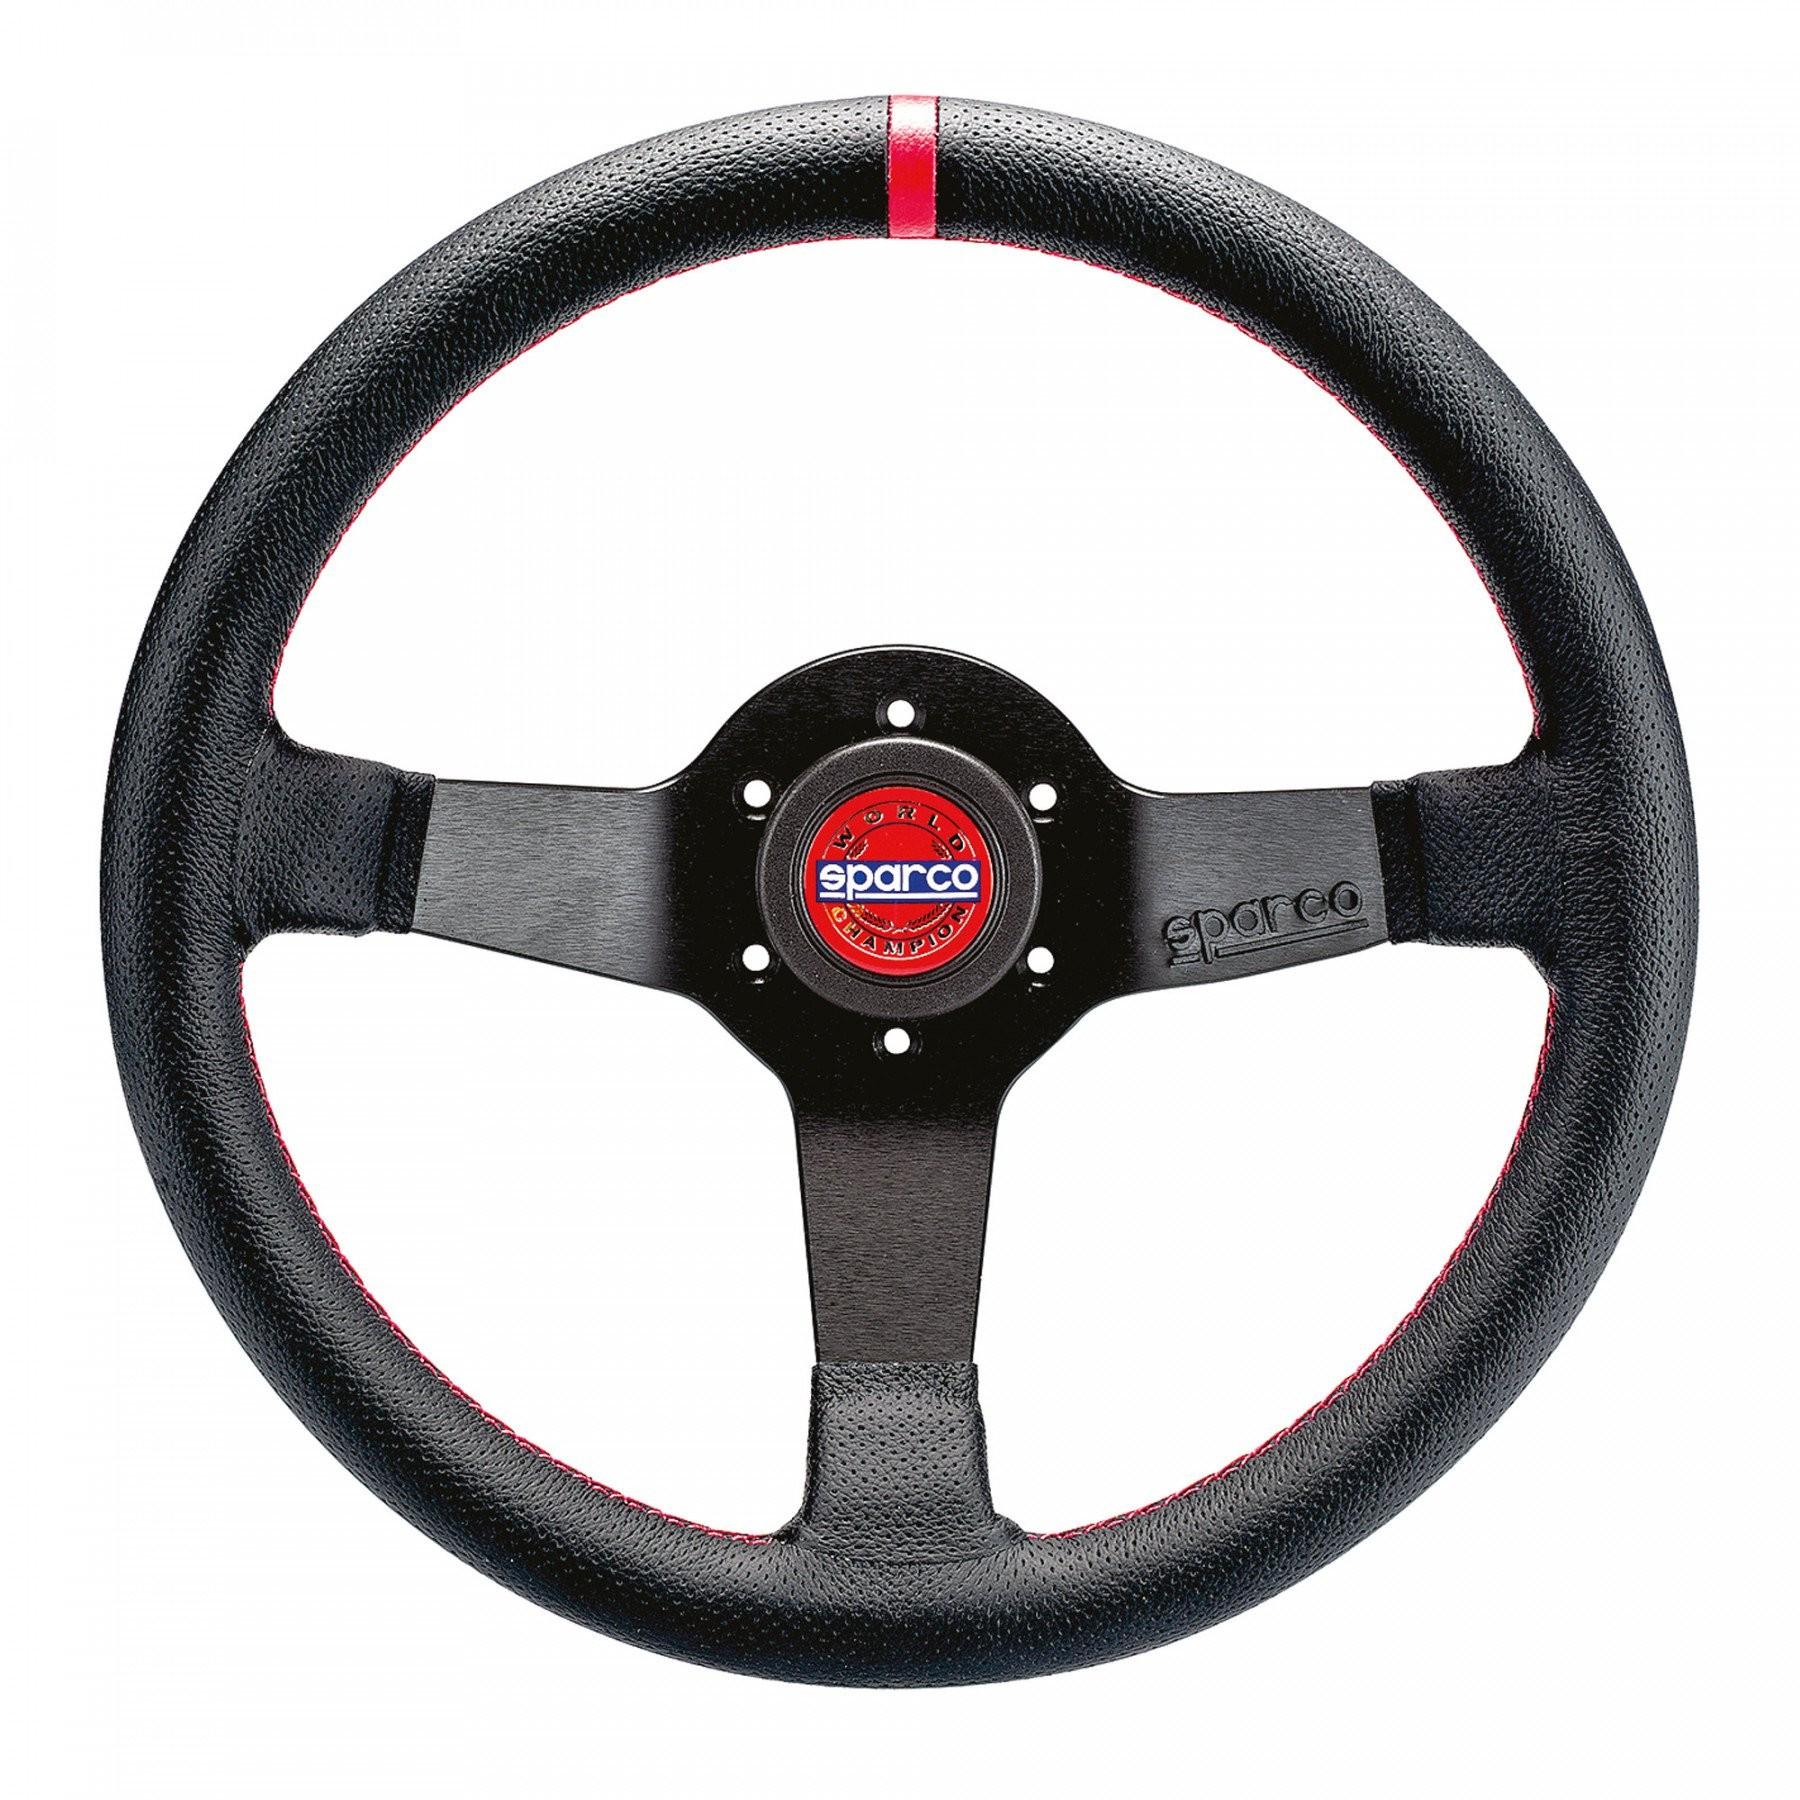 Нов продукт: Sparco Champion, Tuning Steering Whell